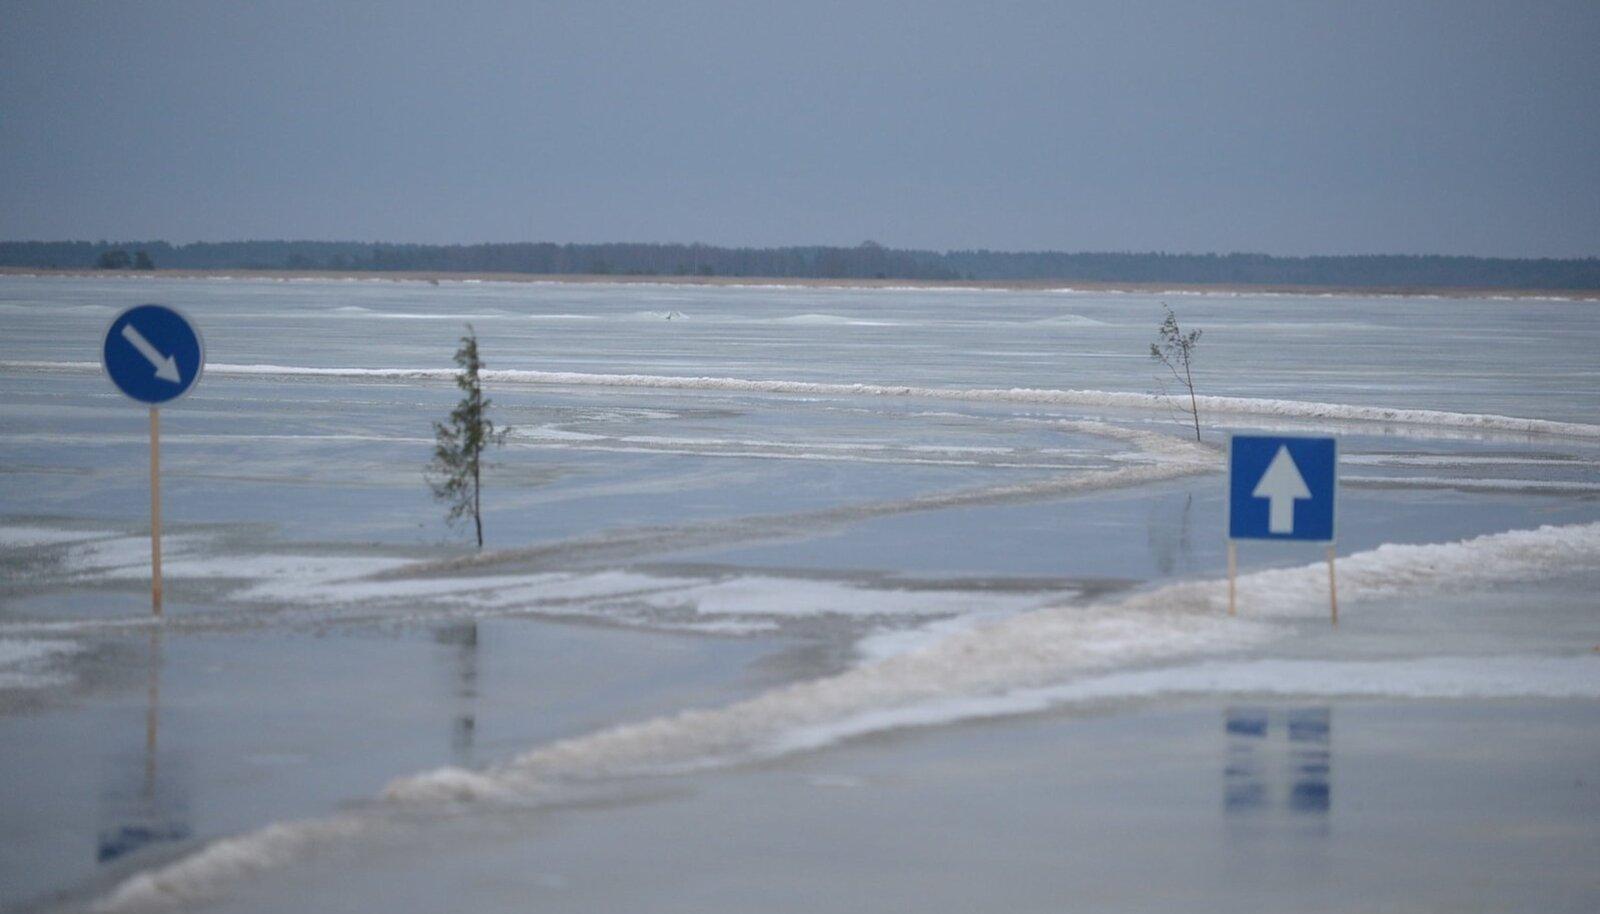 Haapsalu-Noarootsi jäätee 2014. aastal